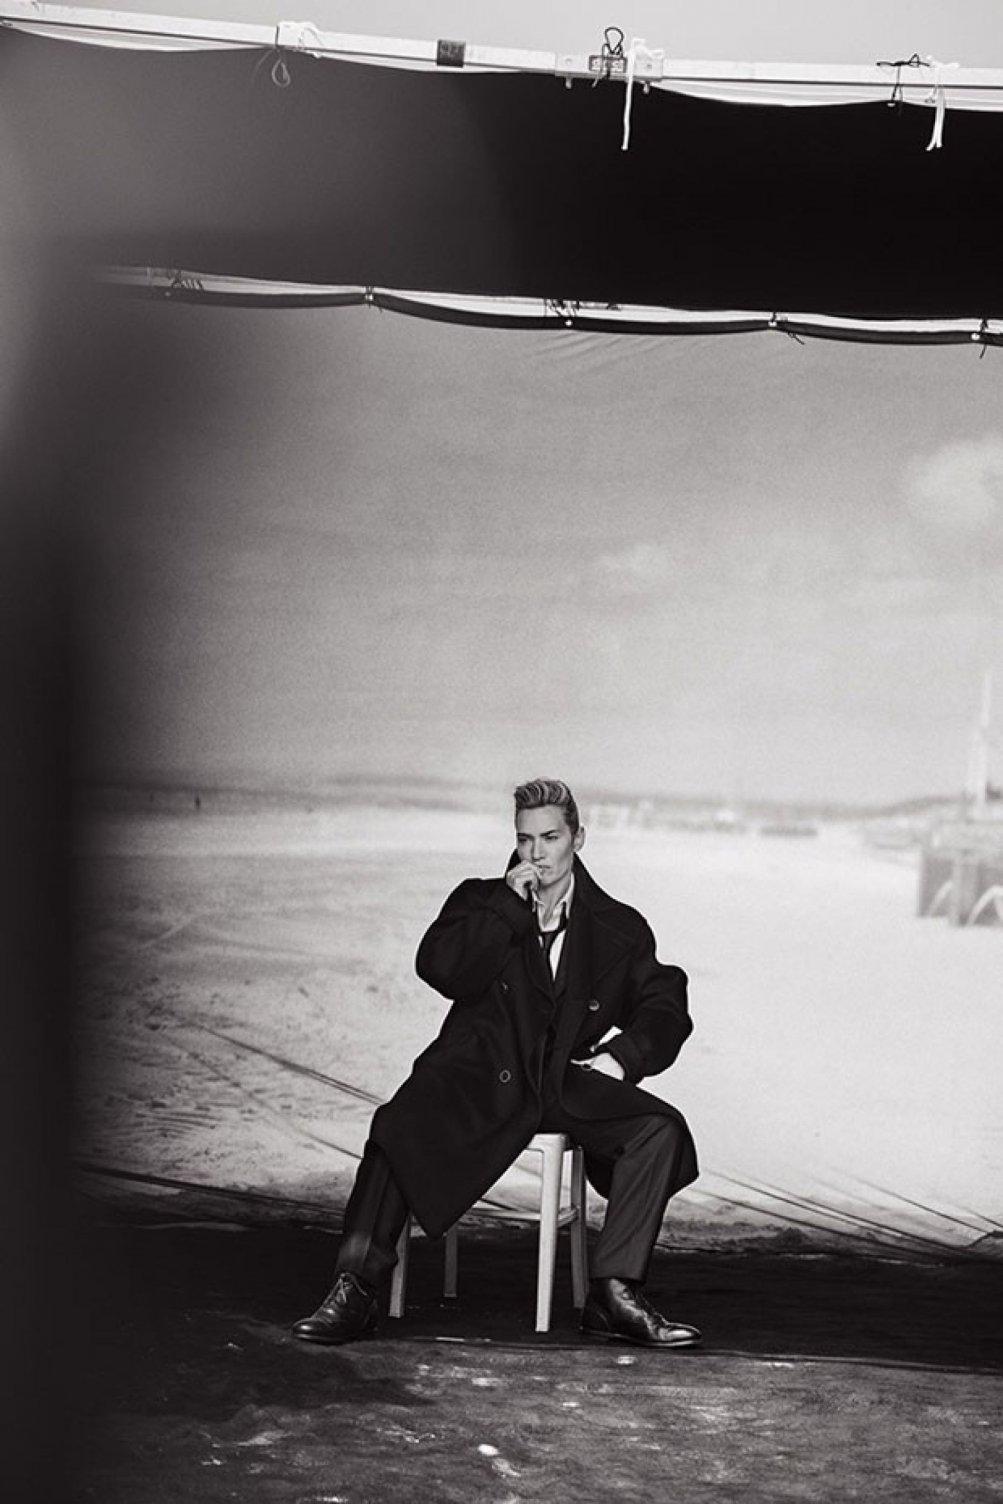 Kate Winslet fotografata da Lindbergh vestita da uomo